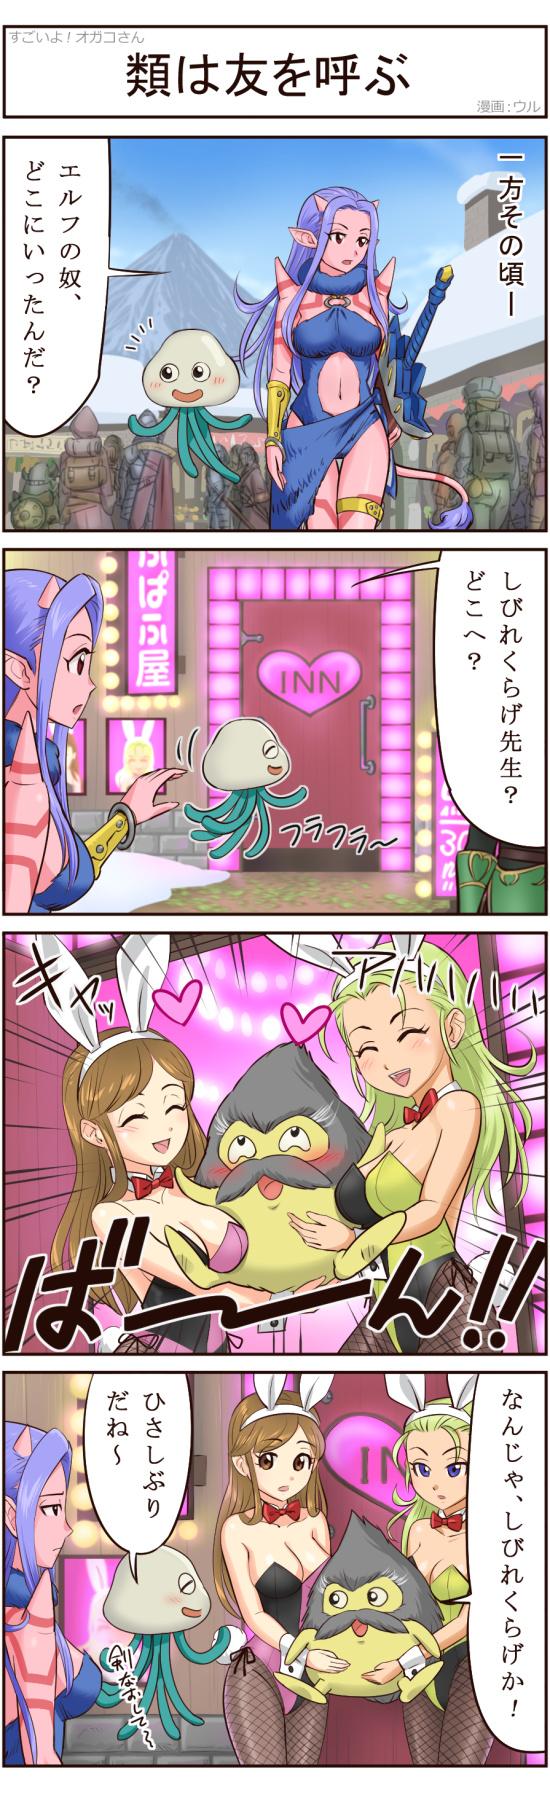 DQX・4コマ漫画すごいよ!オガコさん第41話